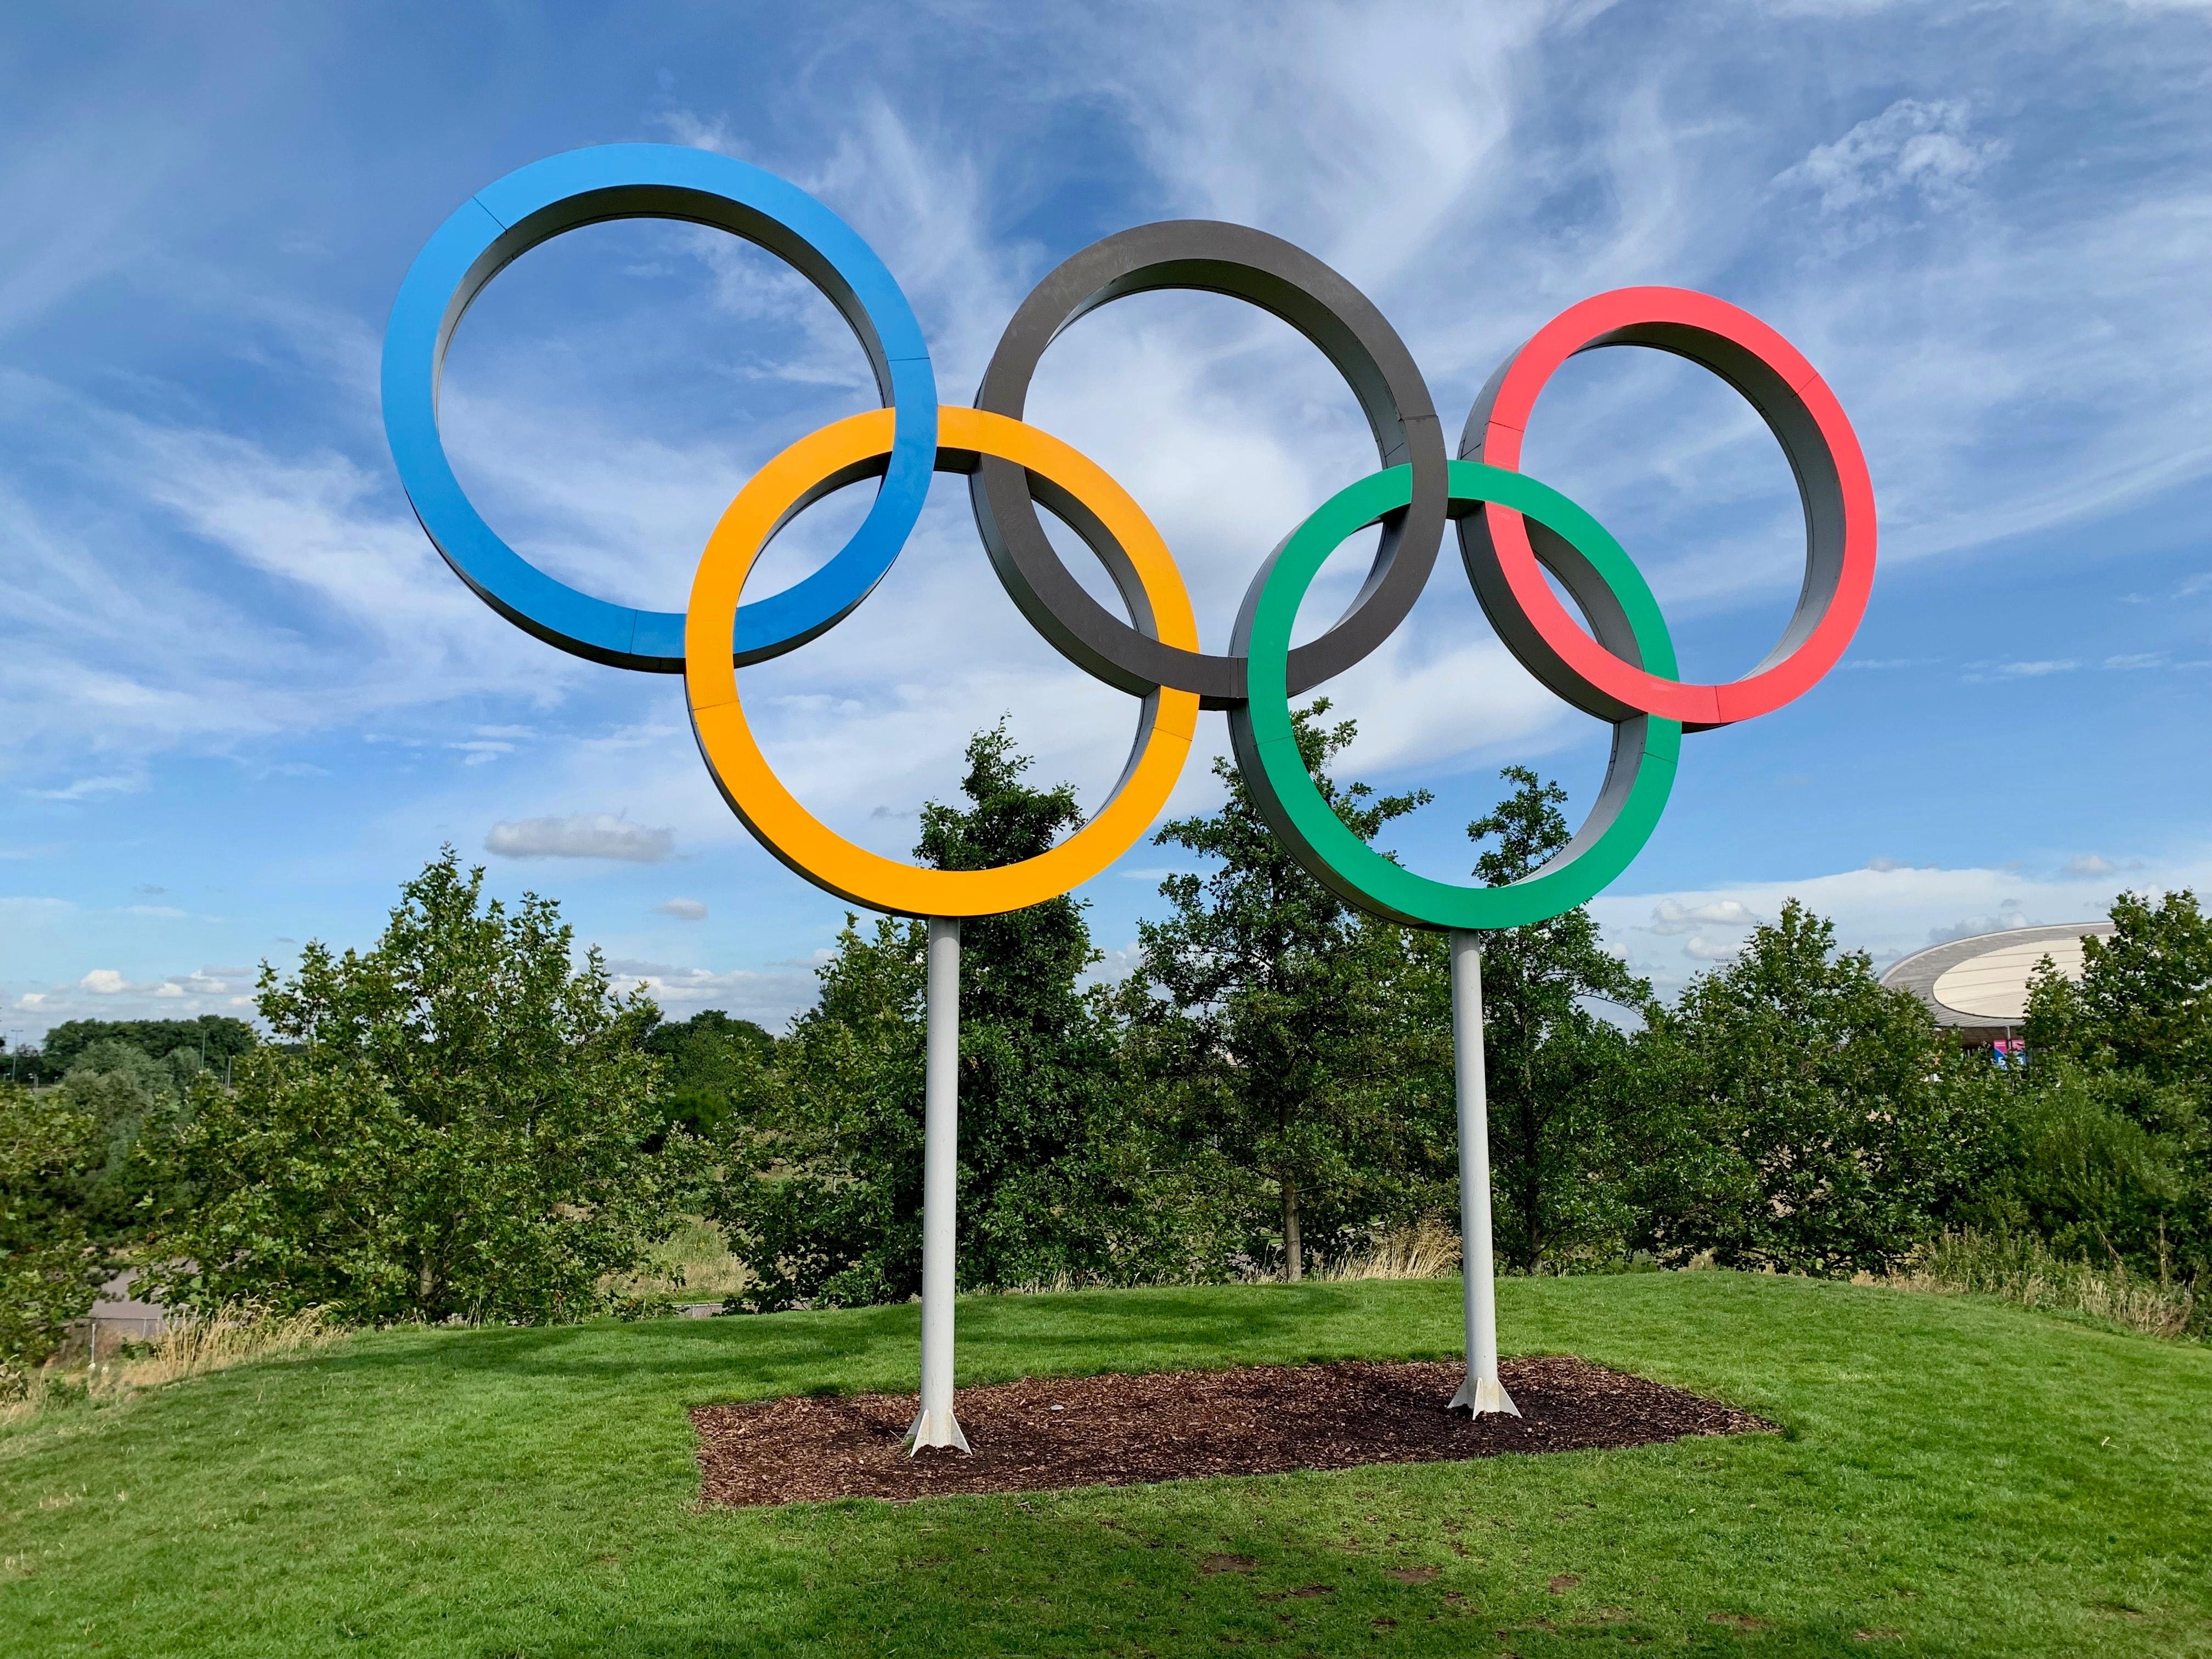 DFB holt Olympiagold während der Coronazeit